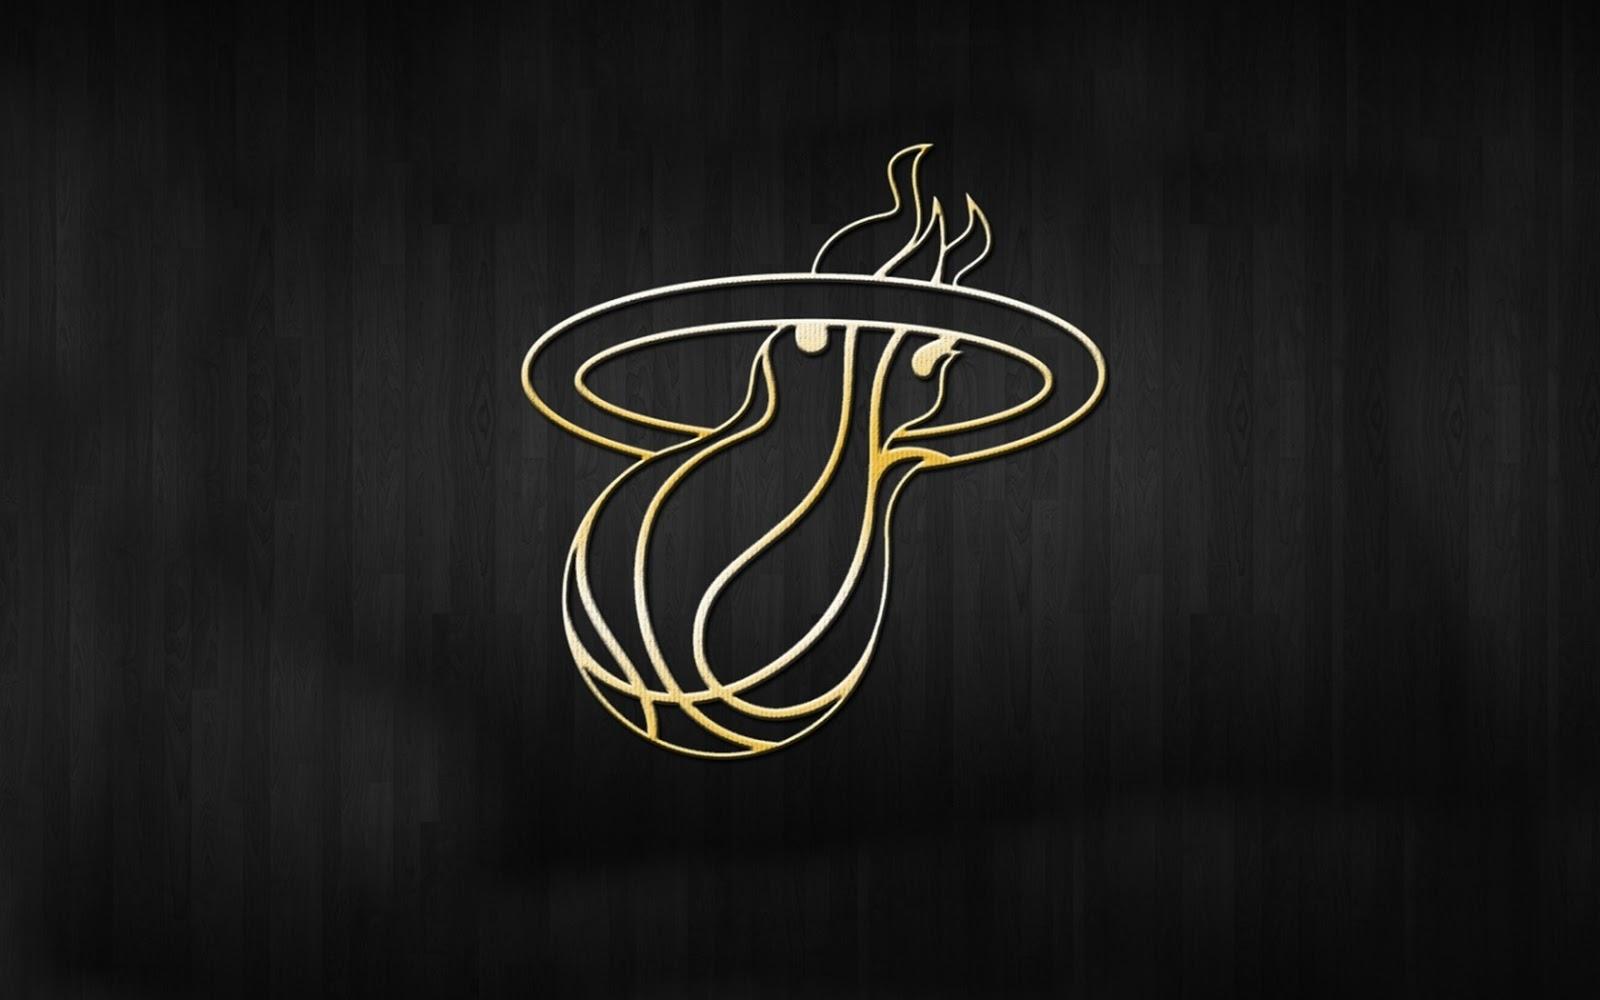 Miami Heat Basketball Club Logo 1600x1000